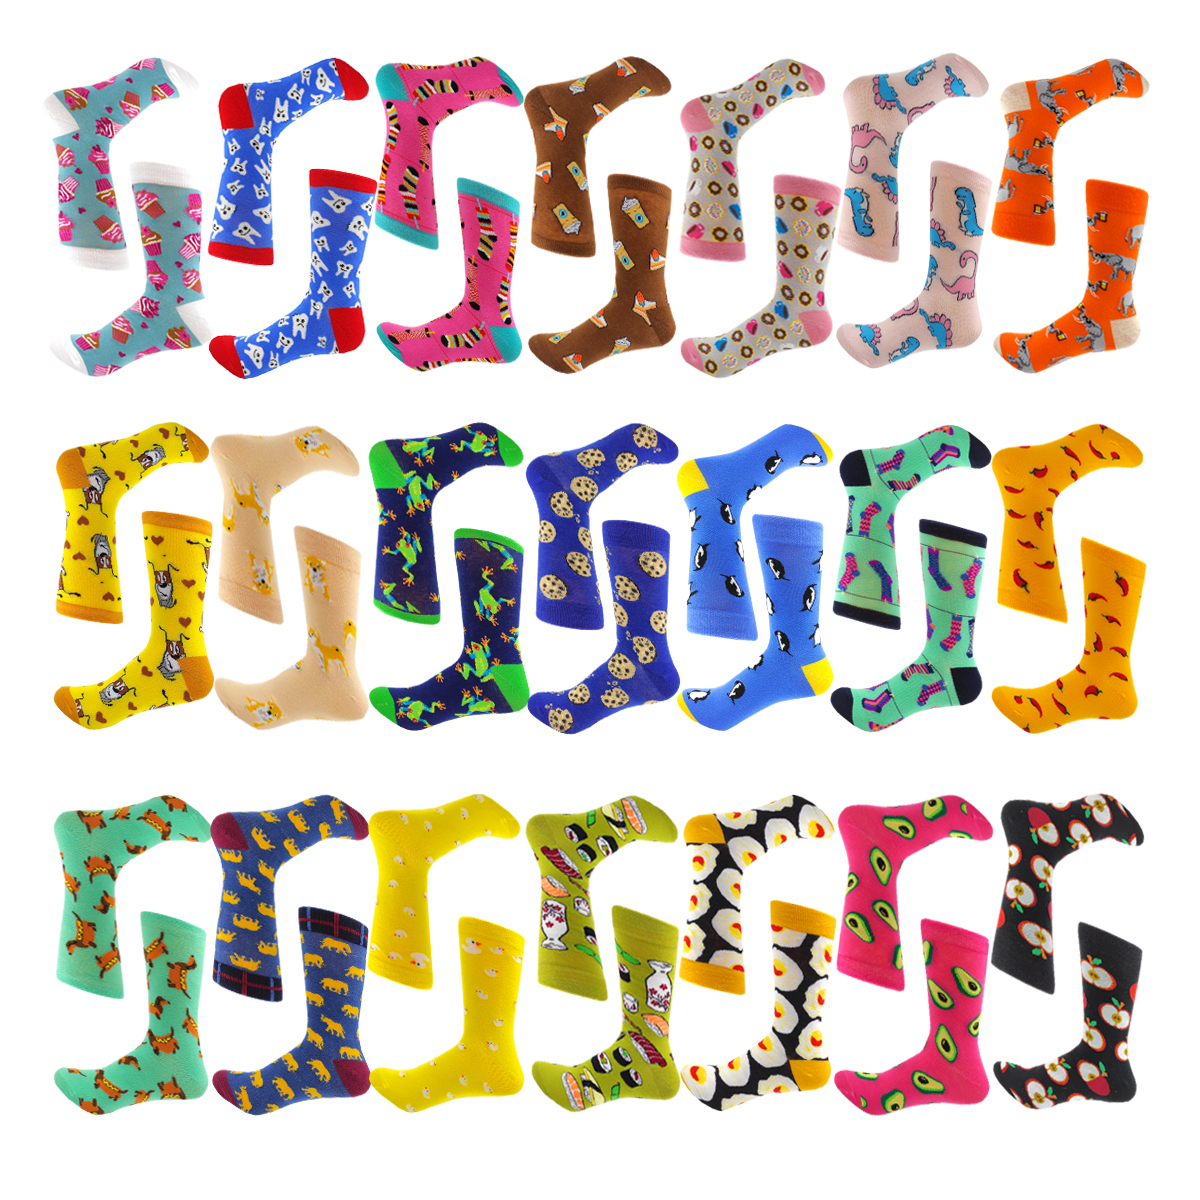 Spring Summer Hip Hop Harajuku Cartoon Cotton Women Socks  Kawaii Cute Pink Apple Eggs Cookies Dog Duck Funny Socks Size35-40